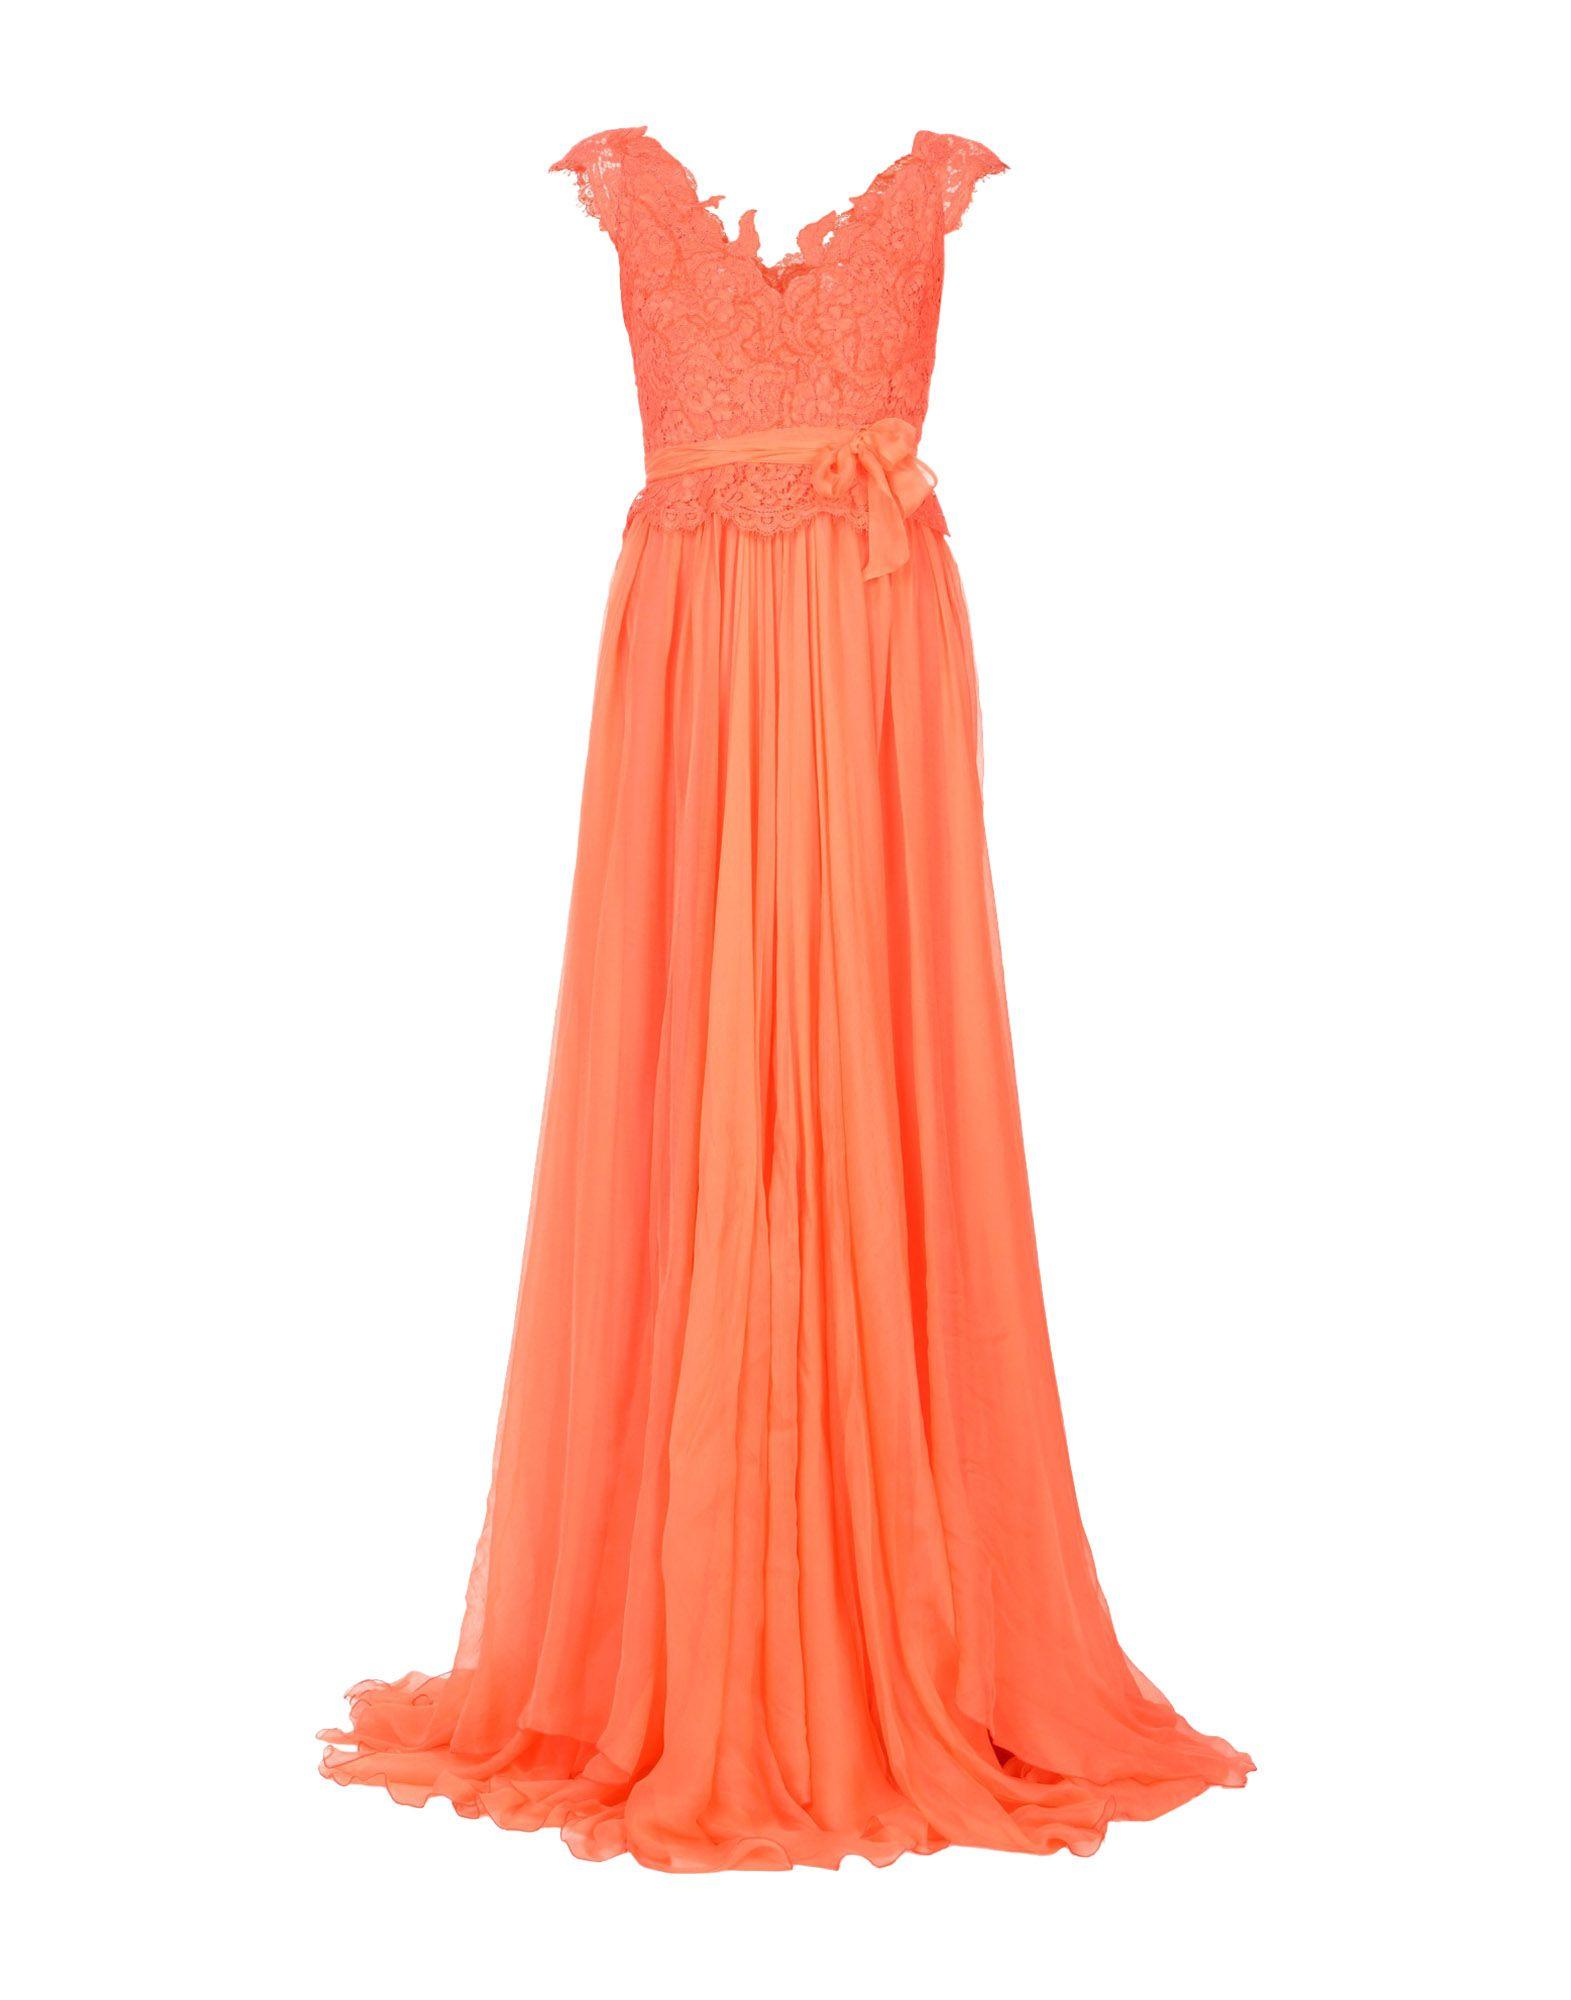 RHEA COSTA Long Dress in Coral